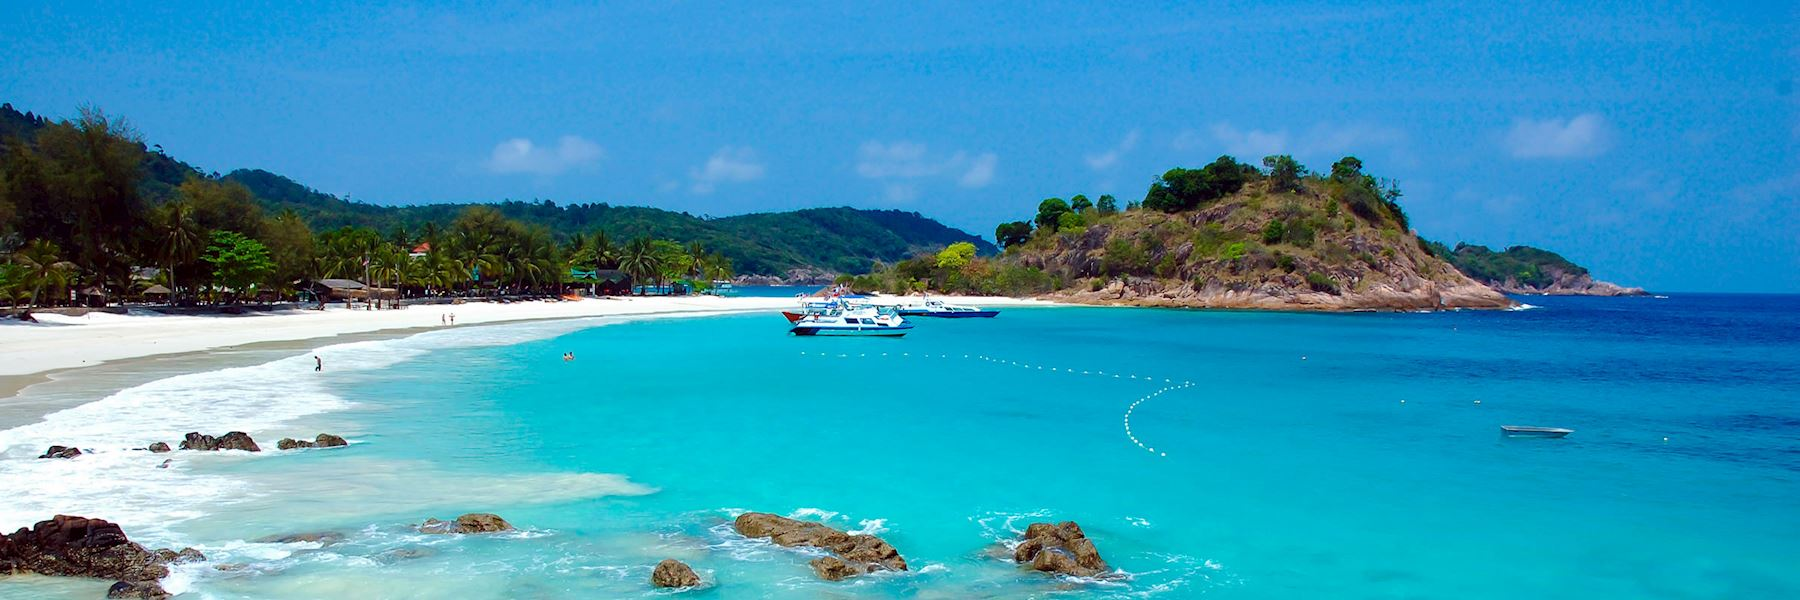 Visit Redang Island, Malaysia